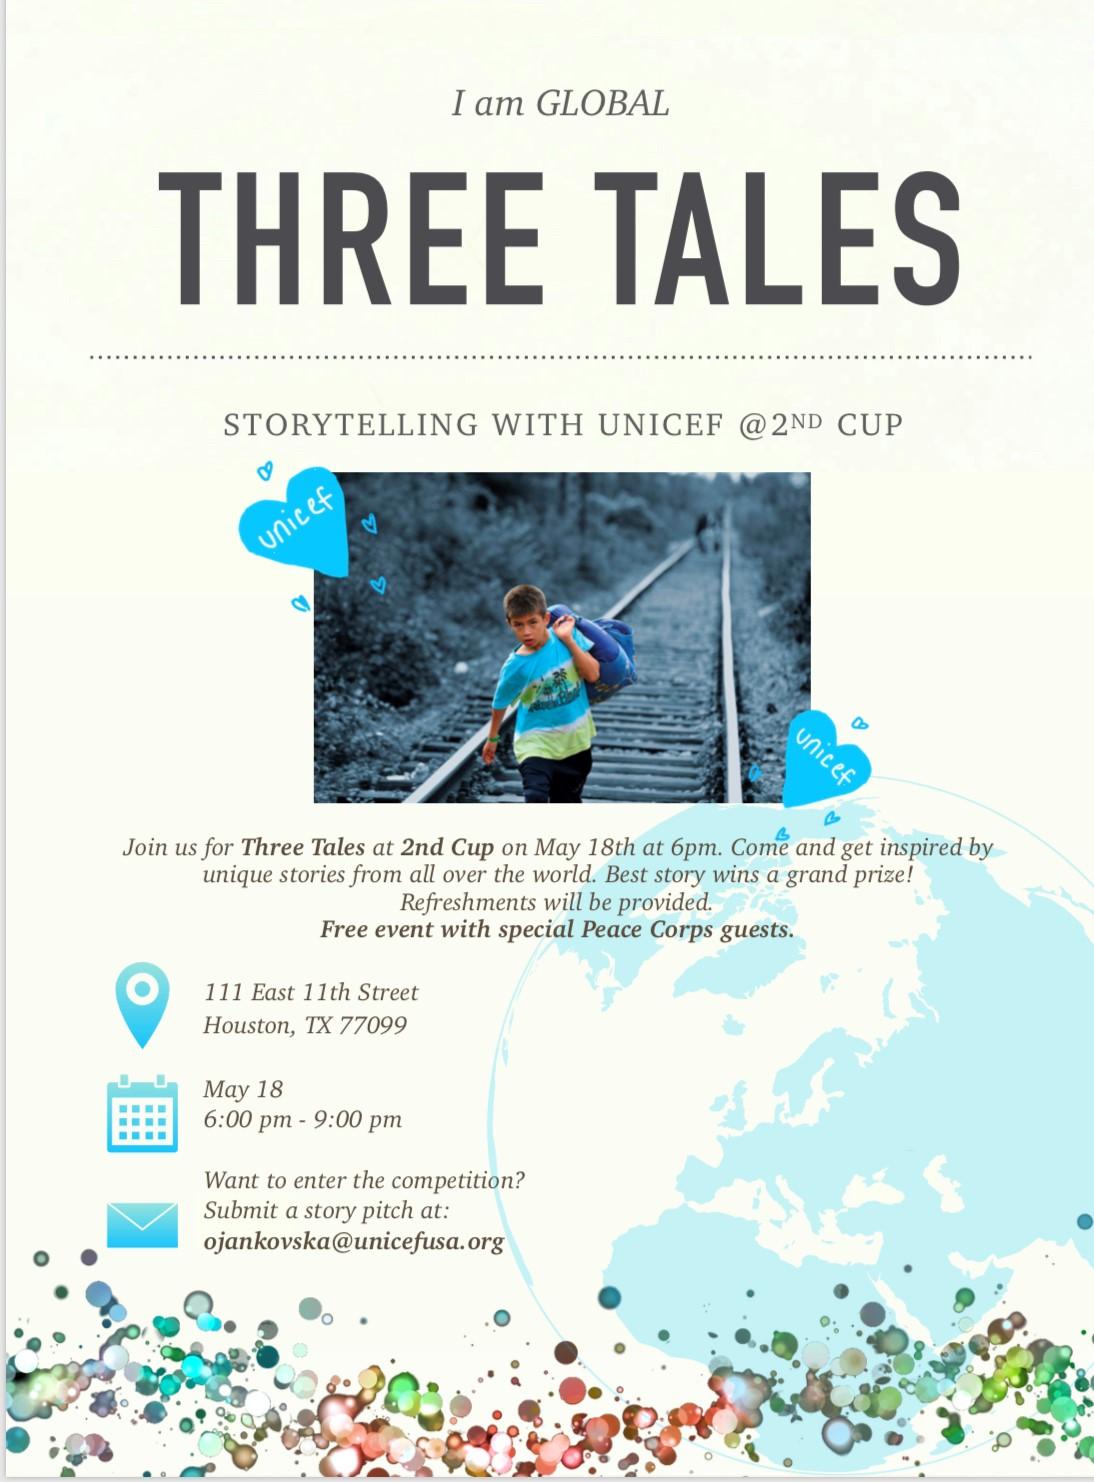 UNICEF UNITE Three Tales - An Evening of Storytelling